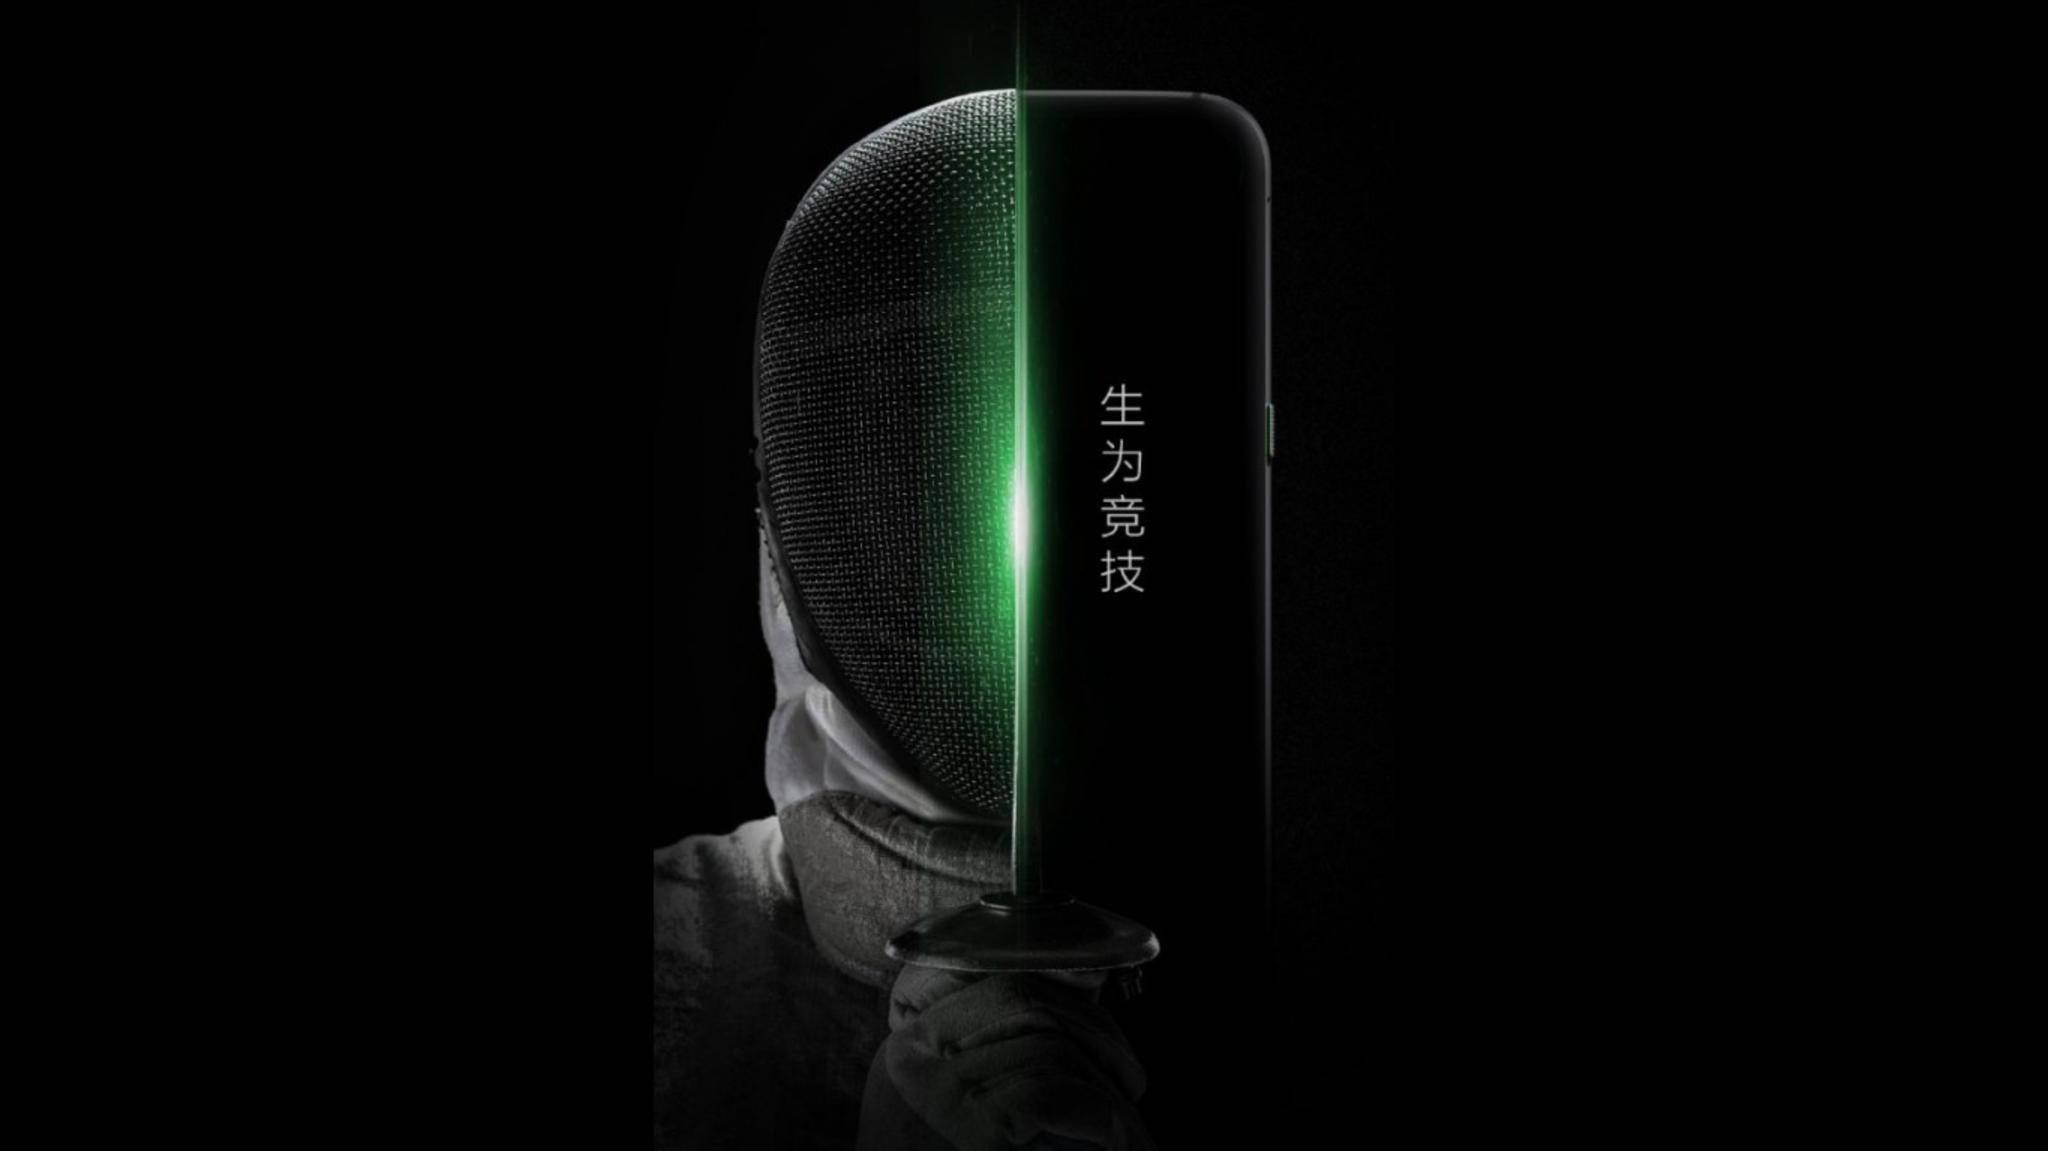 Xiaomis Gaming-Smartphone hat abgerundete Kanten.